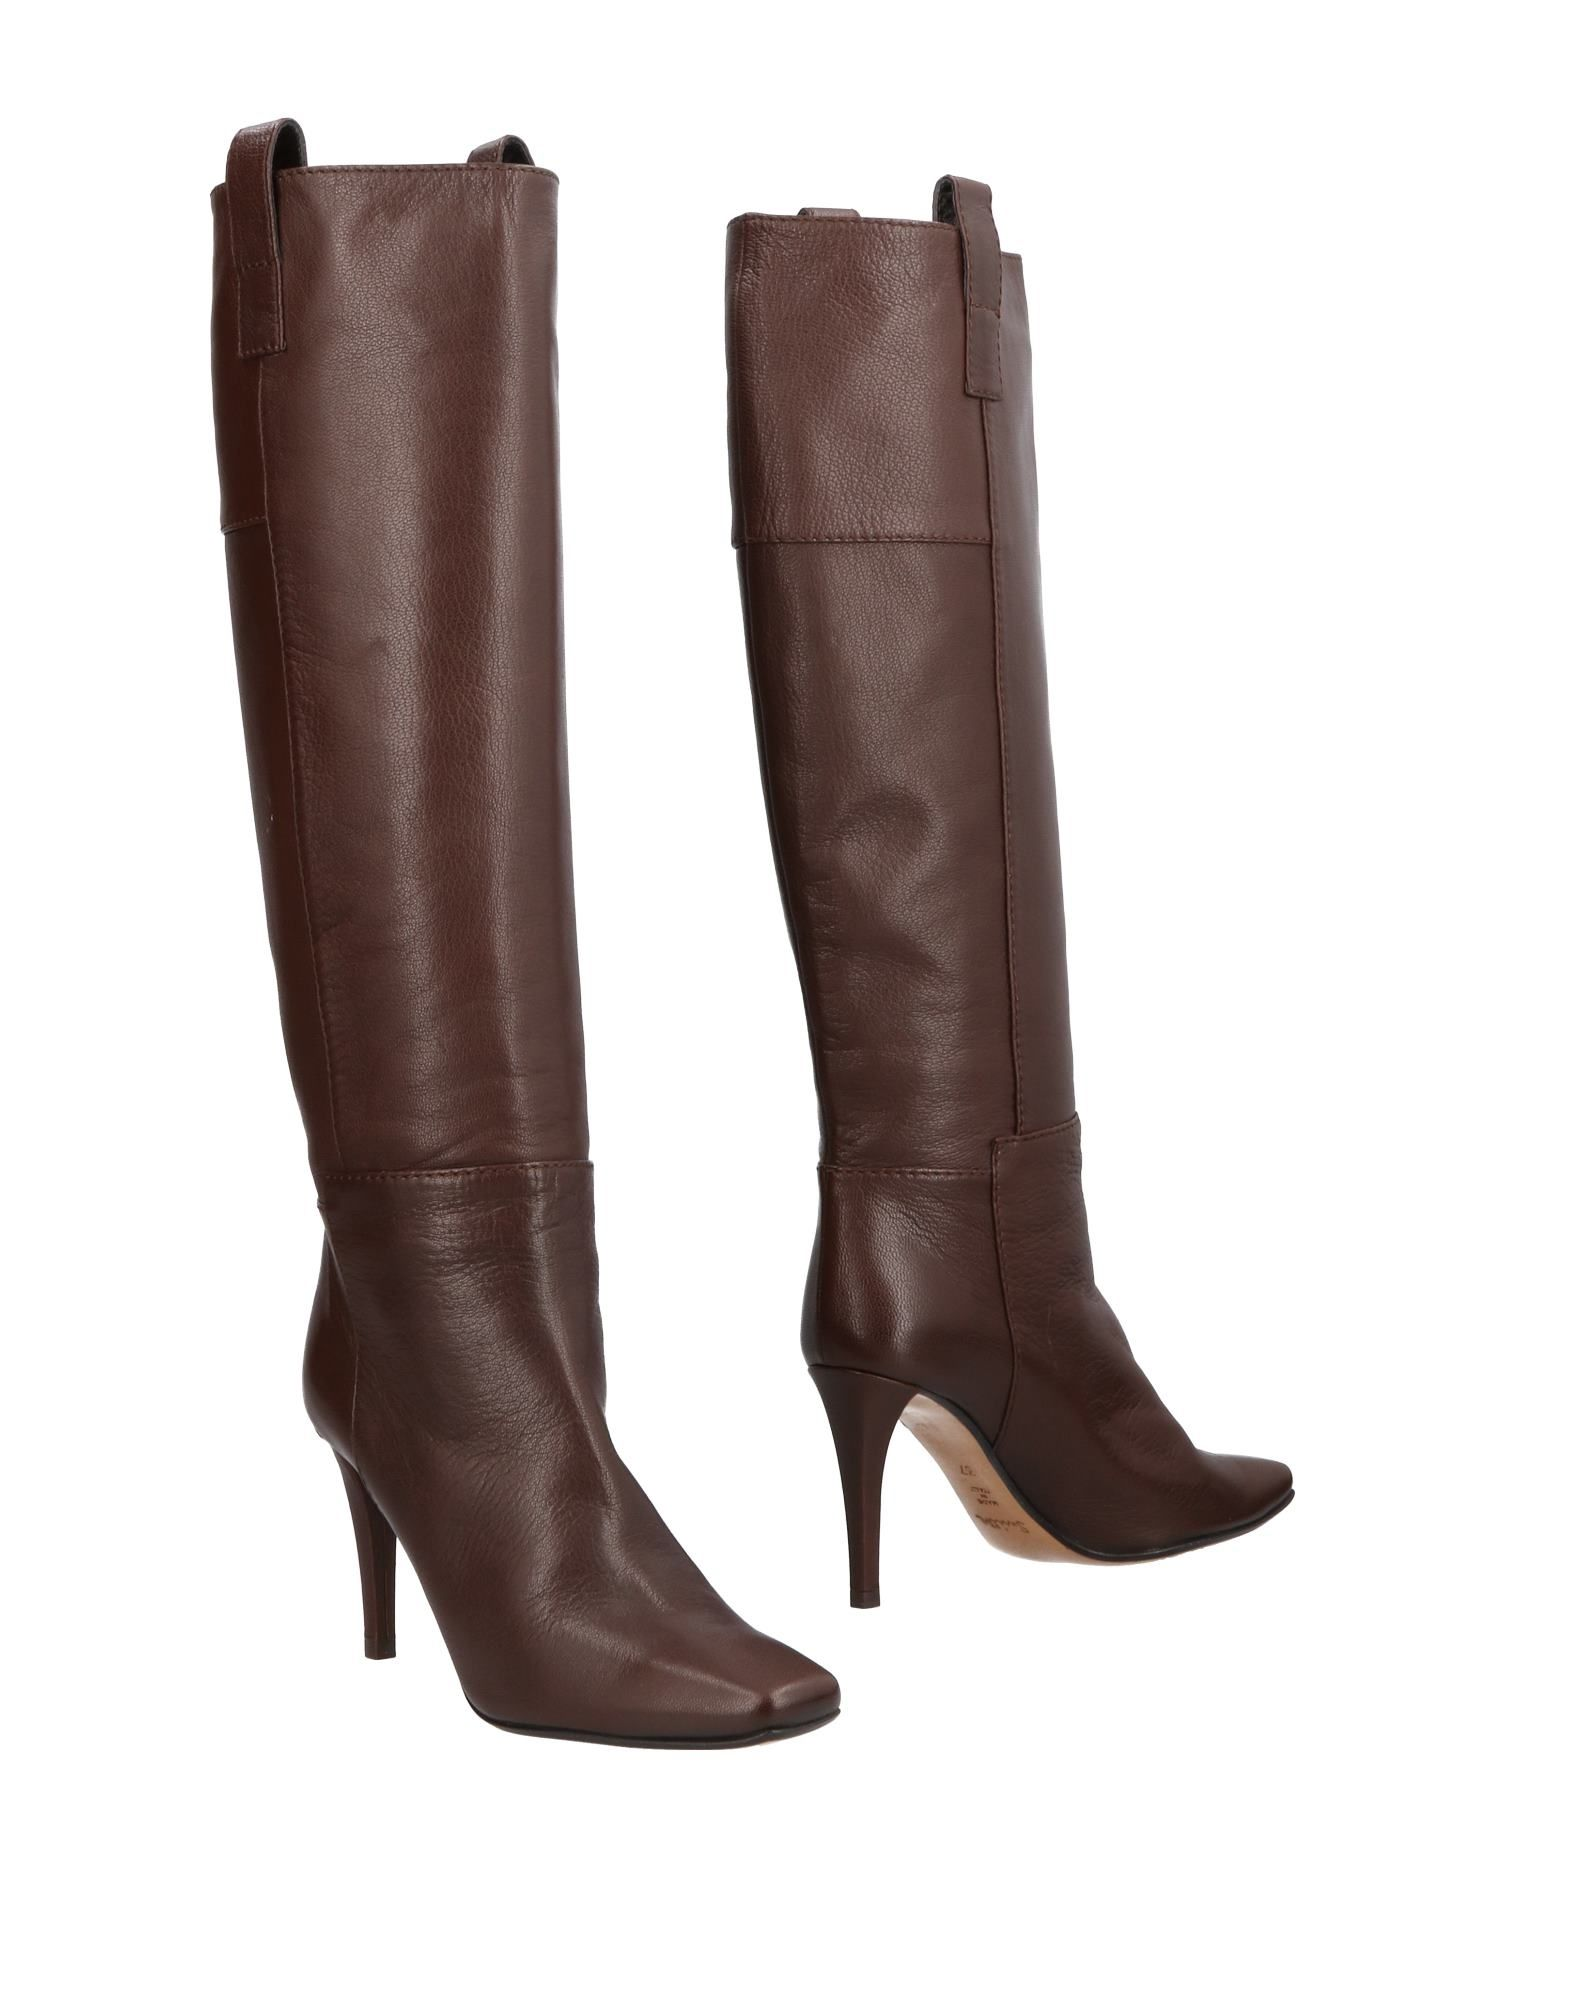 Paul Smith Boots Boots - Women Paul Smith Boots Boots online on  Australia - 11503691QH cc92fe